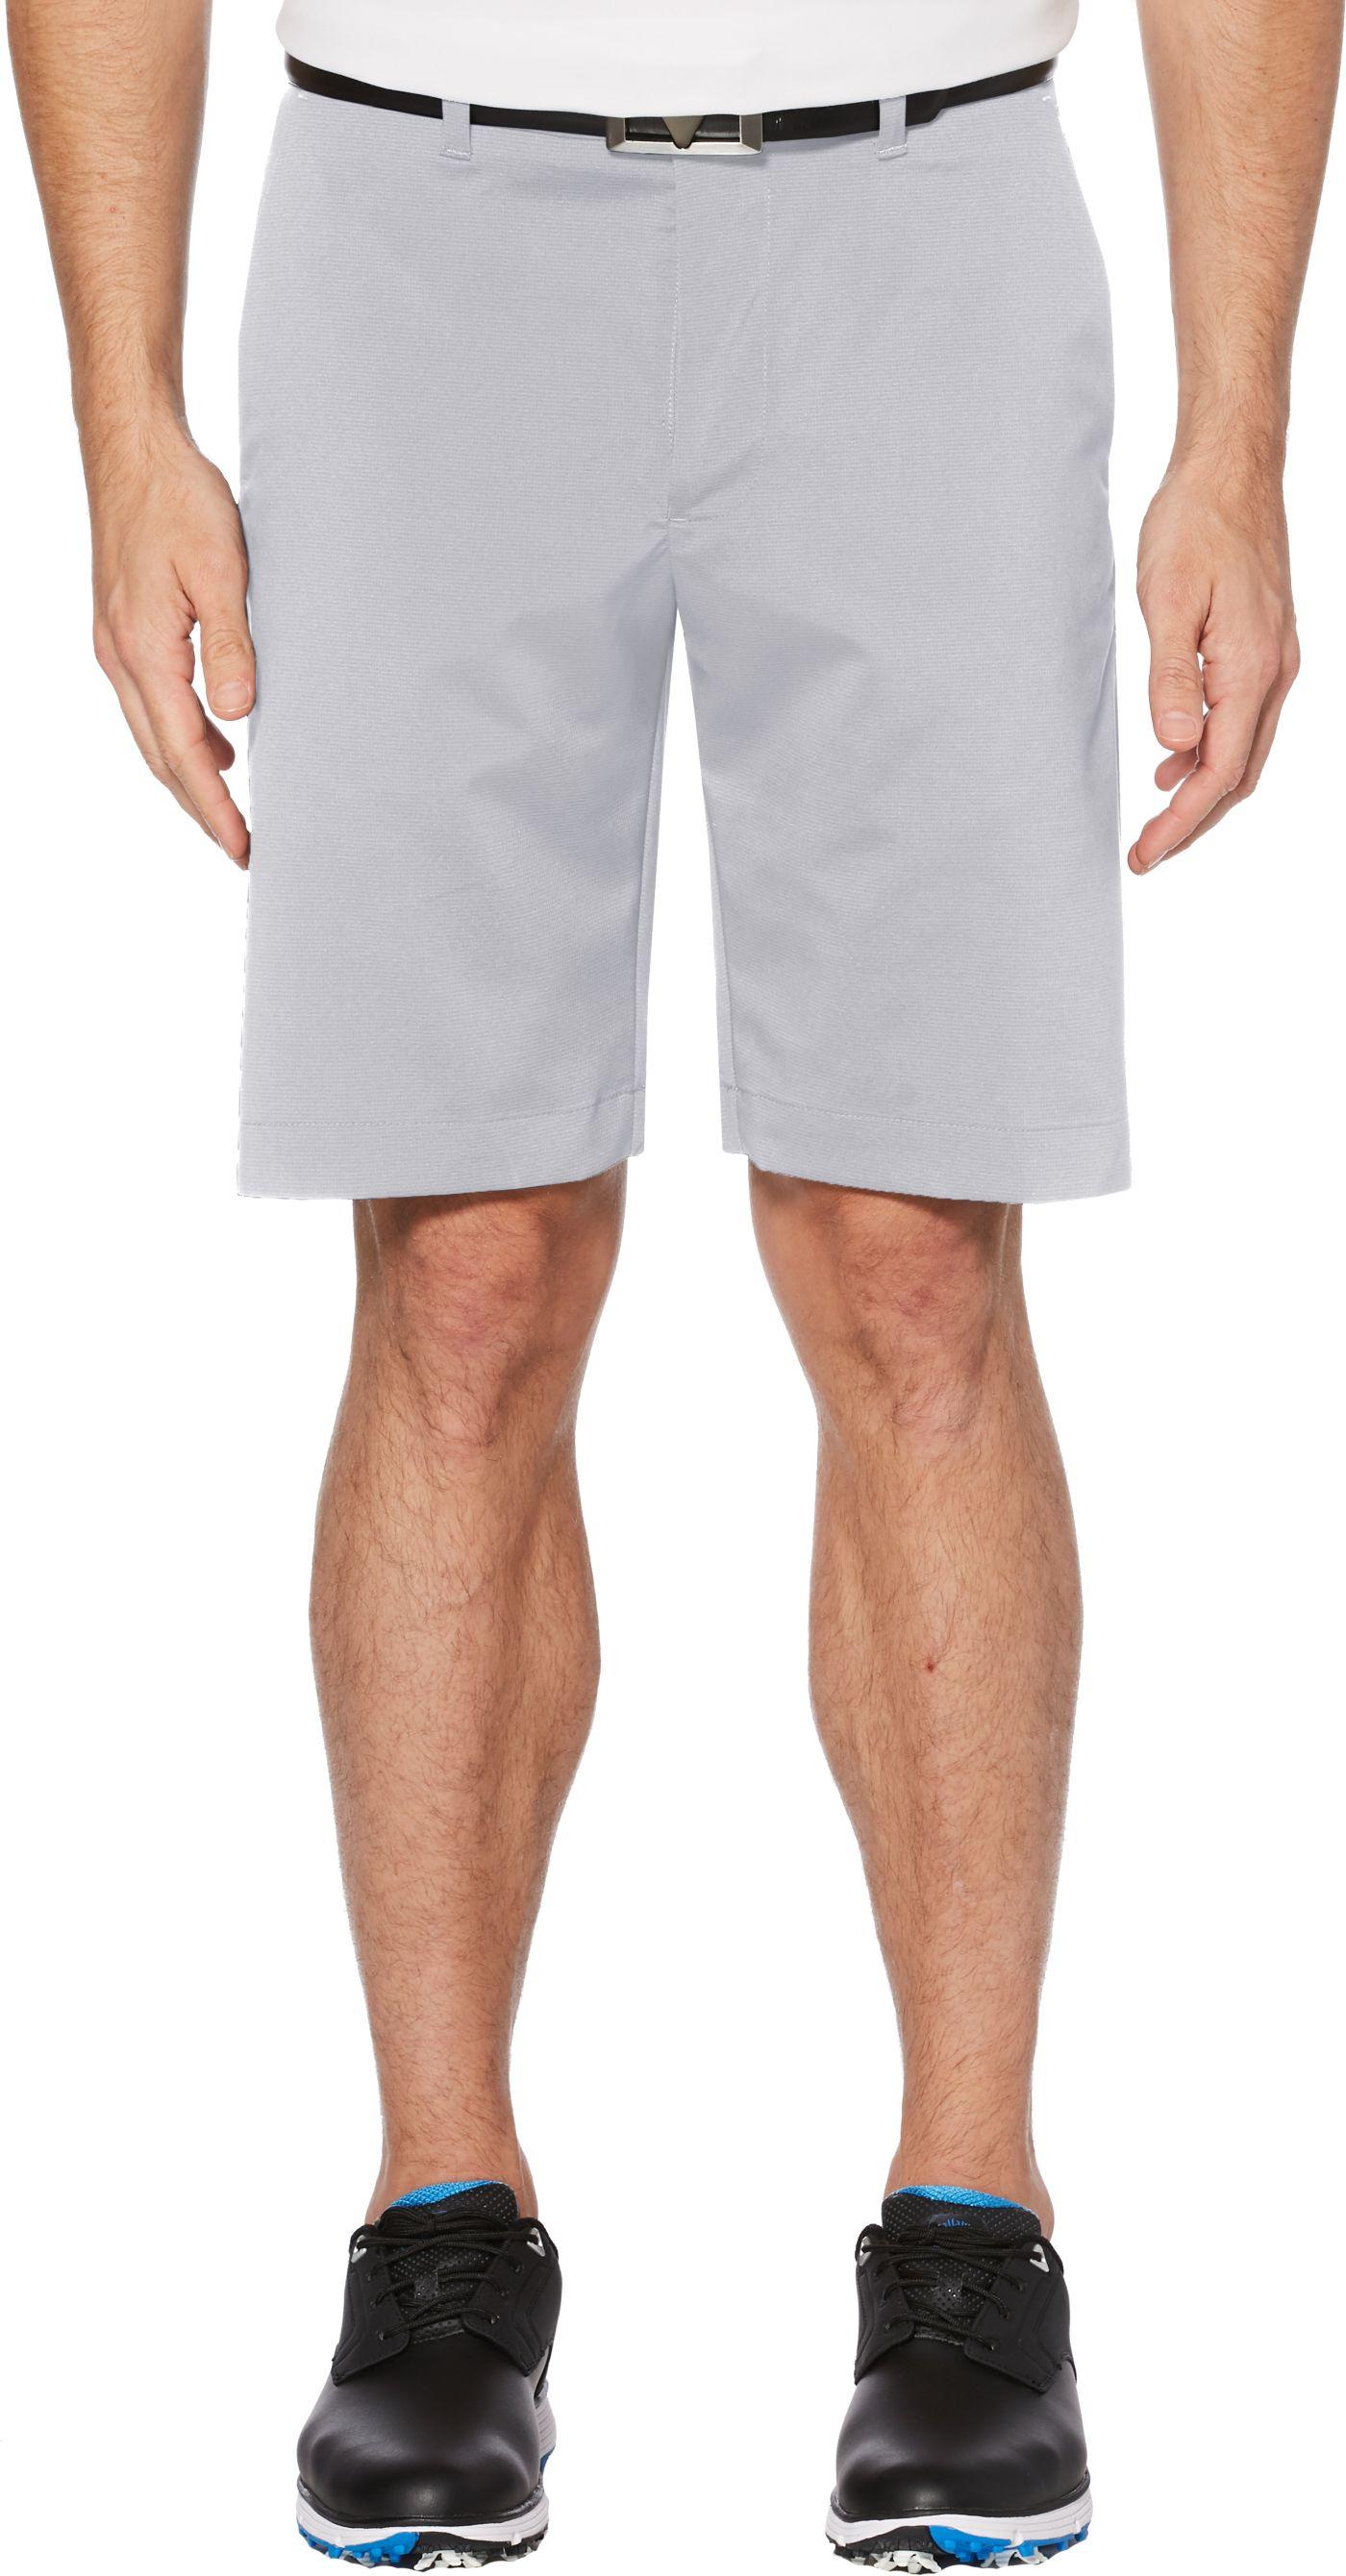 Callaway Men's Swing-Tech Golf Shorts